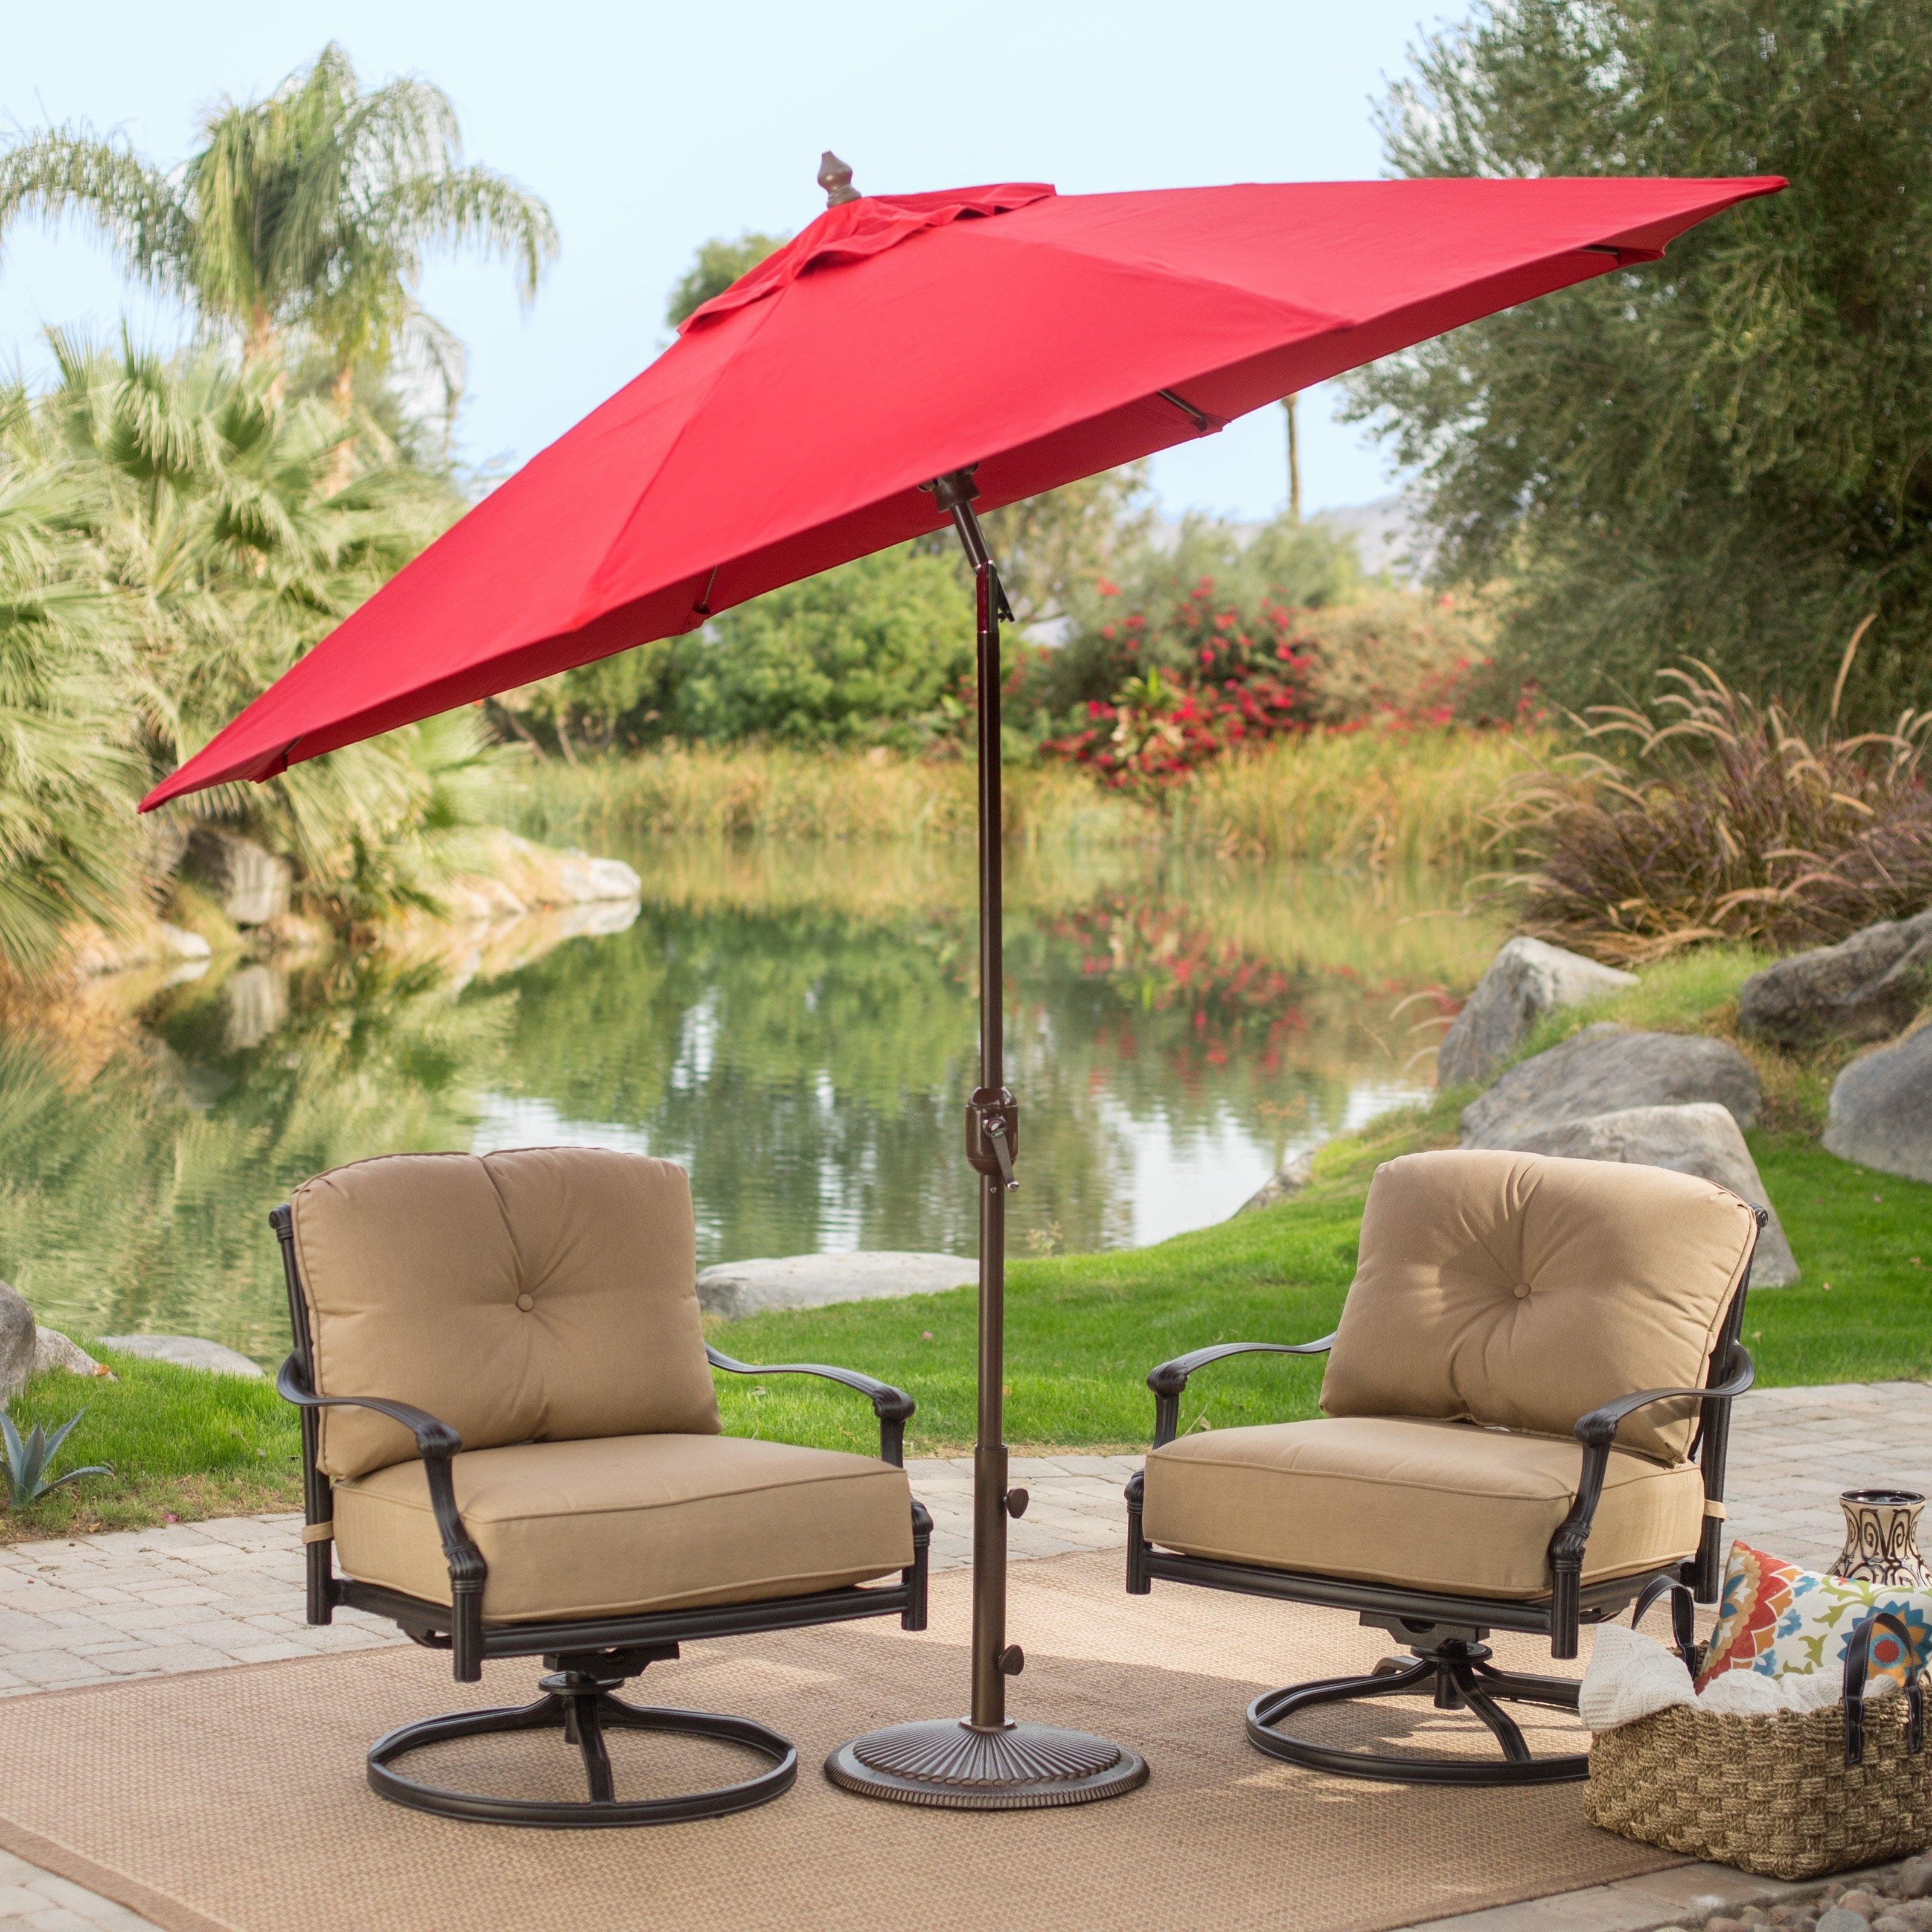 Patio Umbrella: Best Umbrella For You – Bellissimainteriors Regarding Well Known Cheap Patio Umbrellas (Gallery 6 of 20)